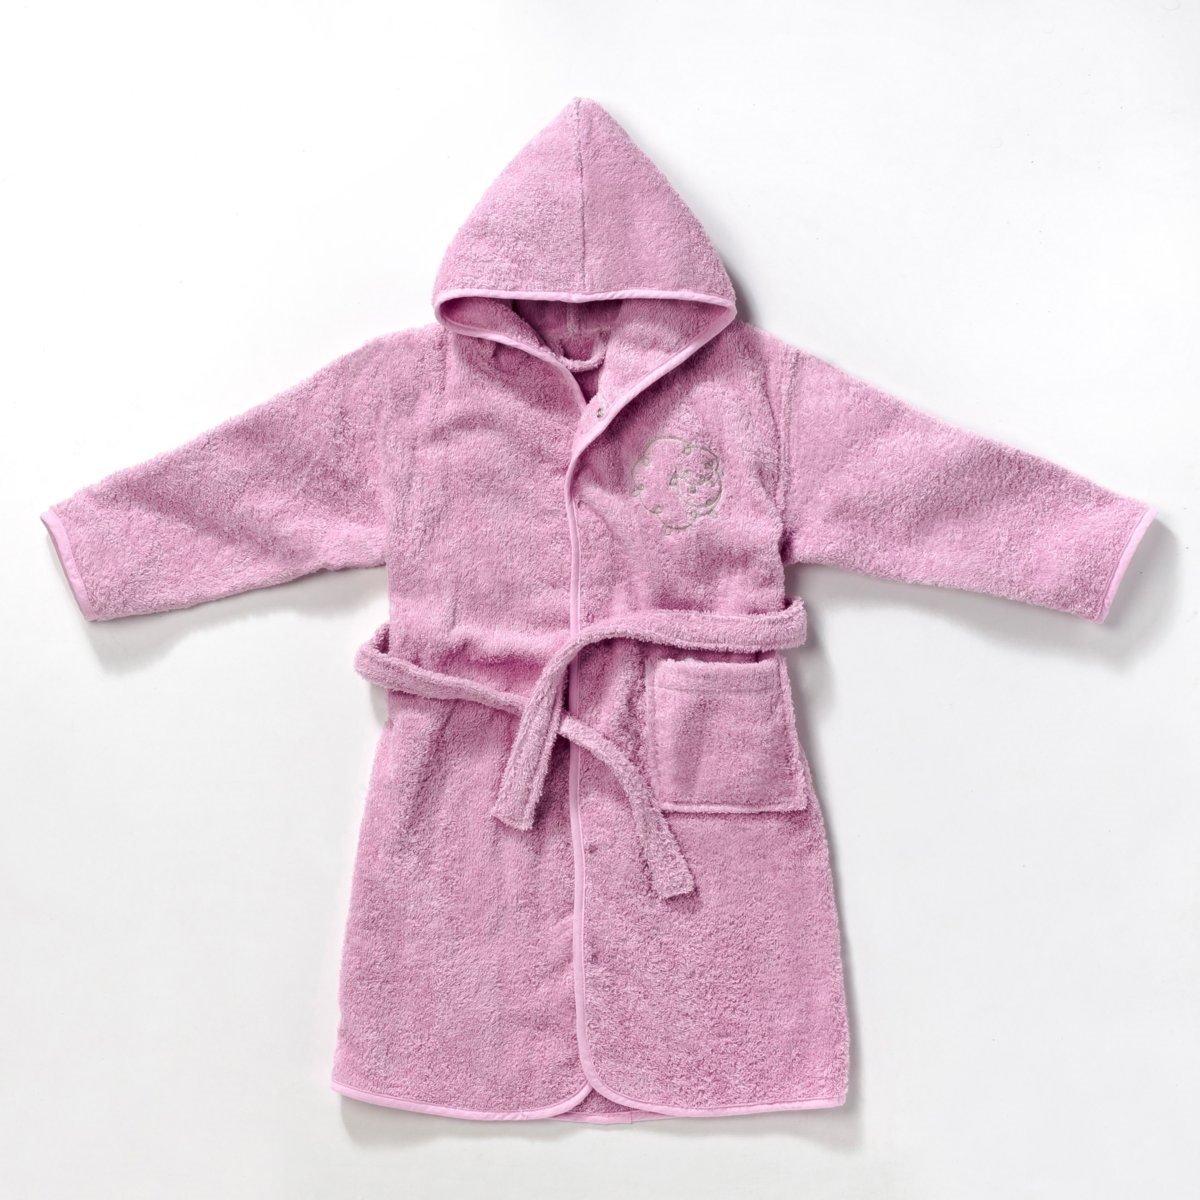 La Redoute R Mini Rizo Albornoz Fur Niños quotbetsiequot 420 gm, Rosa, 94 cm (3 Jahre): Amazon.es: Hogar